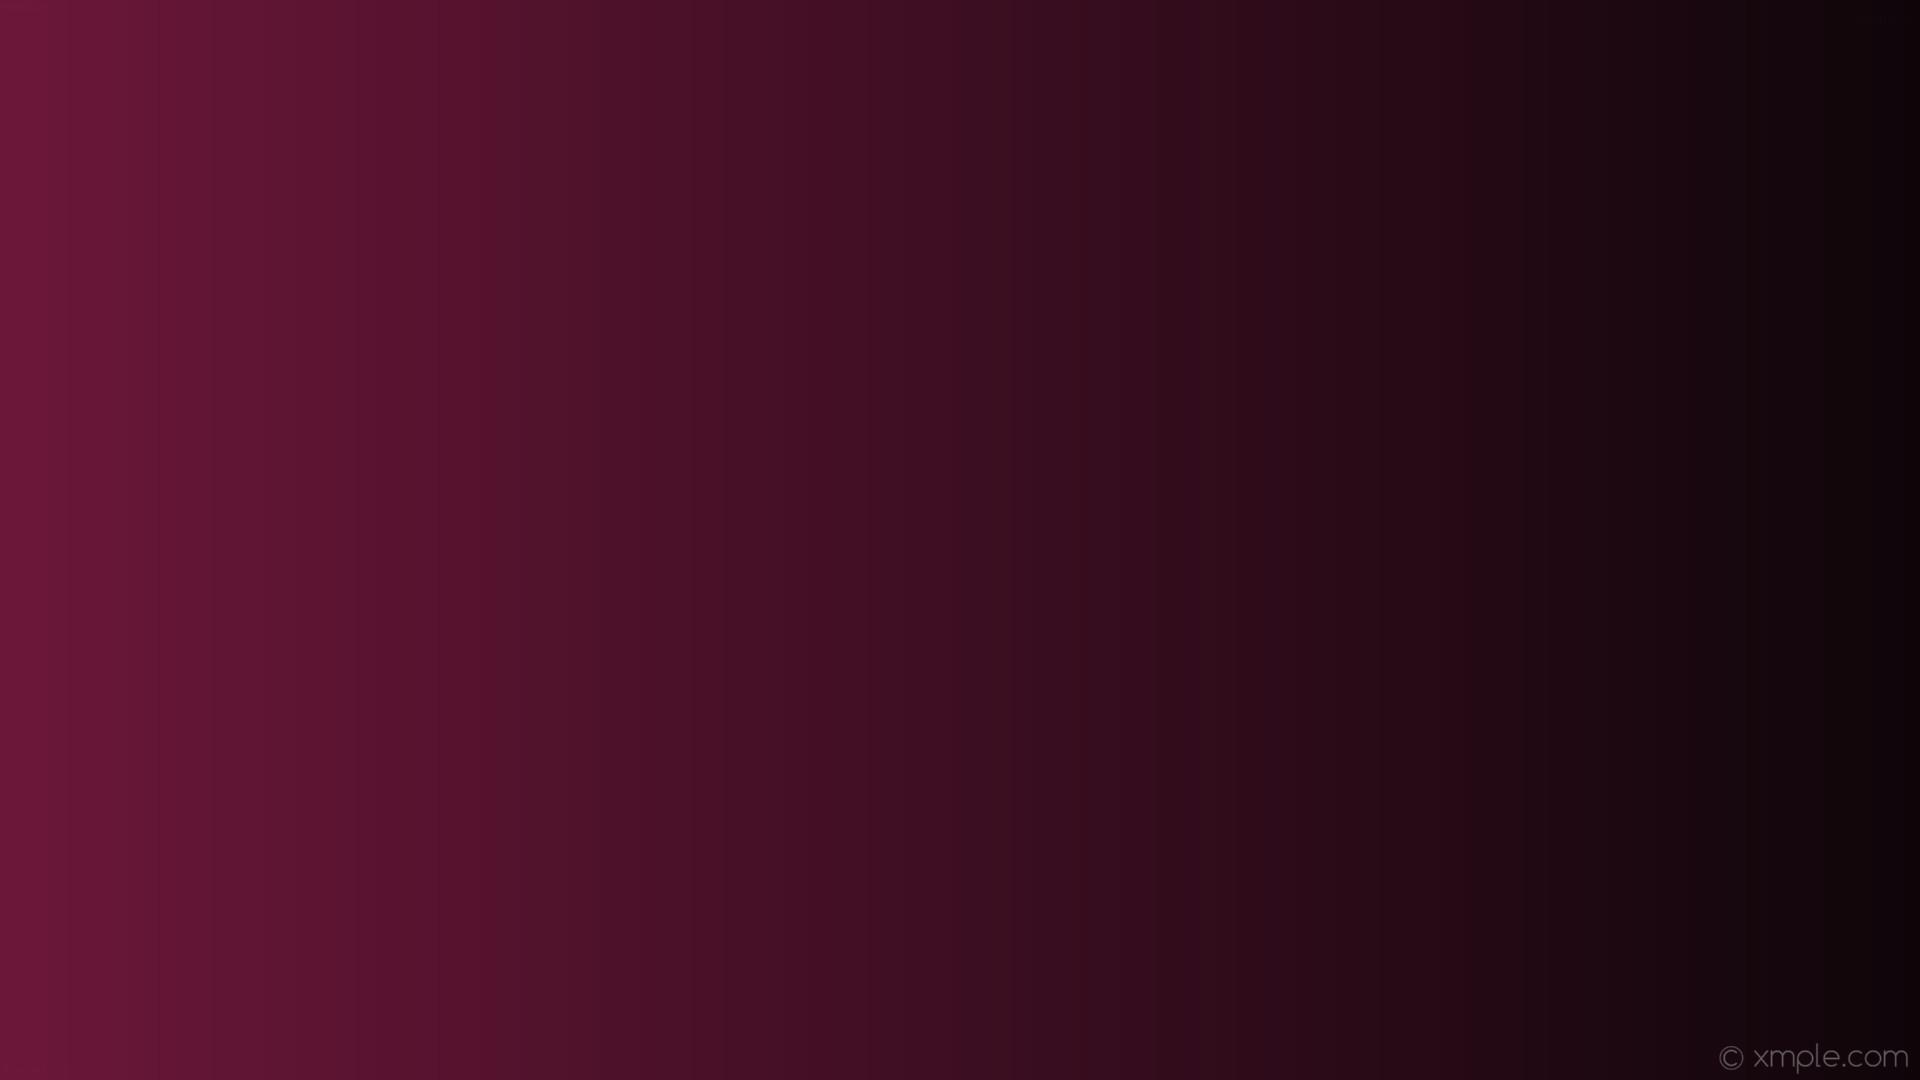 wallpaper pink linear black gradient #0e0509 #6c173a 0°